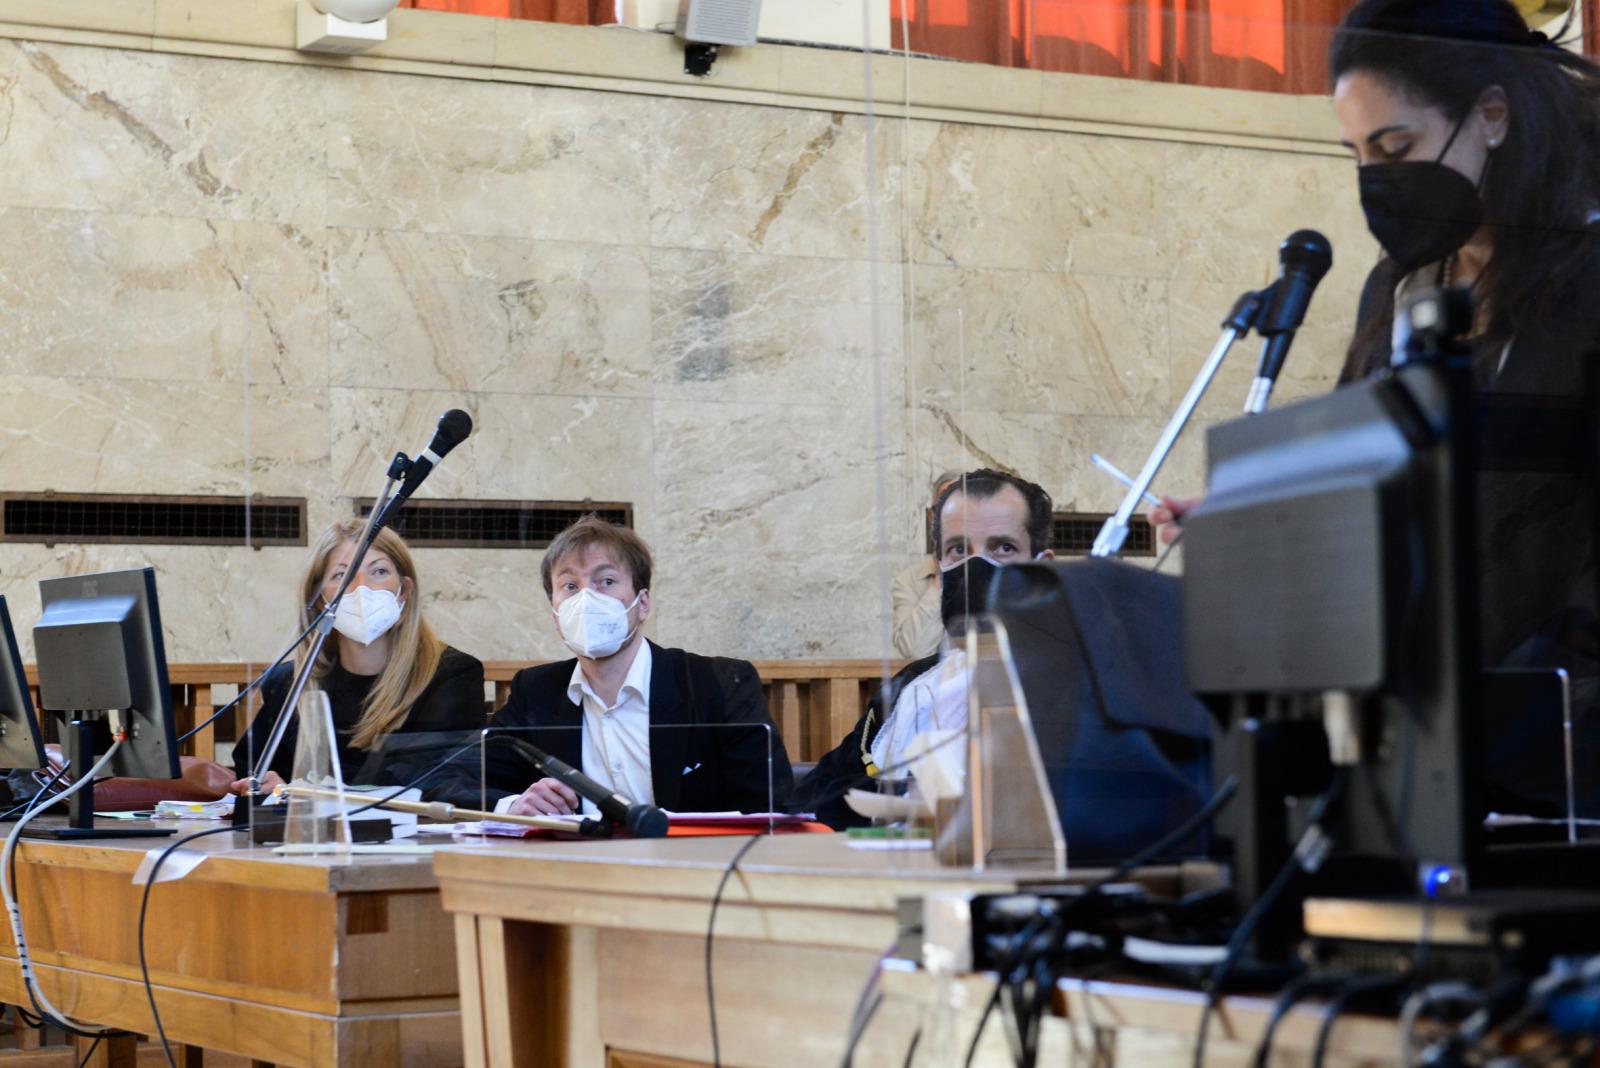 Karl Baer mit RechtsanwaeltInnen am 28.05.2021 vor Landesgericht Bozen Christoph Doerfler